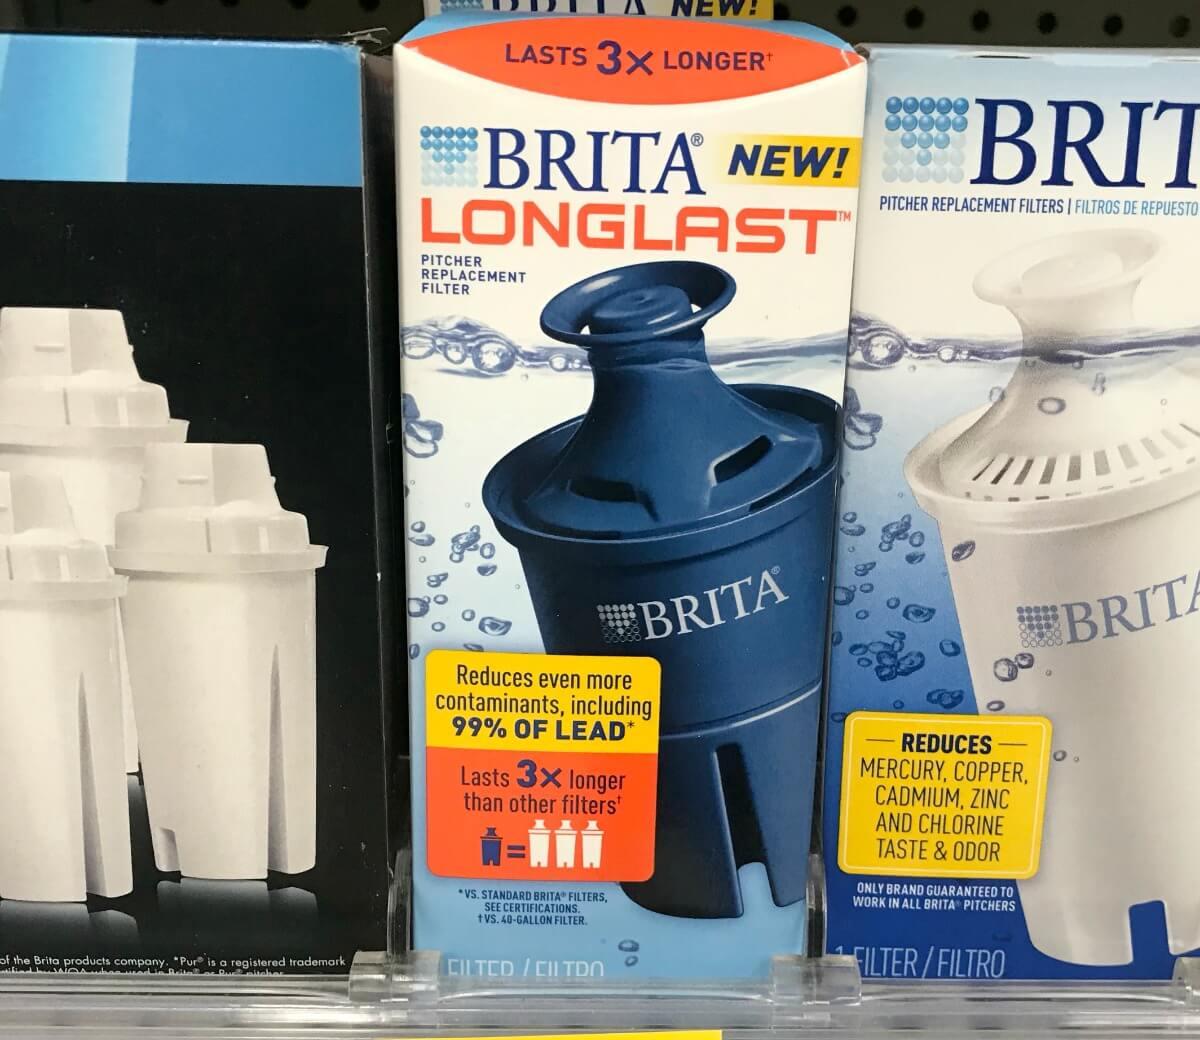 New $3/1 Brita Longlast Filters, Standard Filters or Ultramax Water